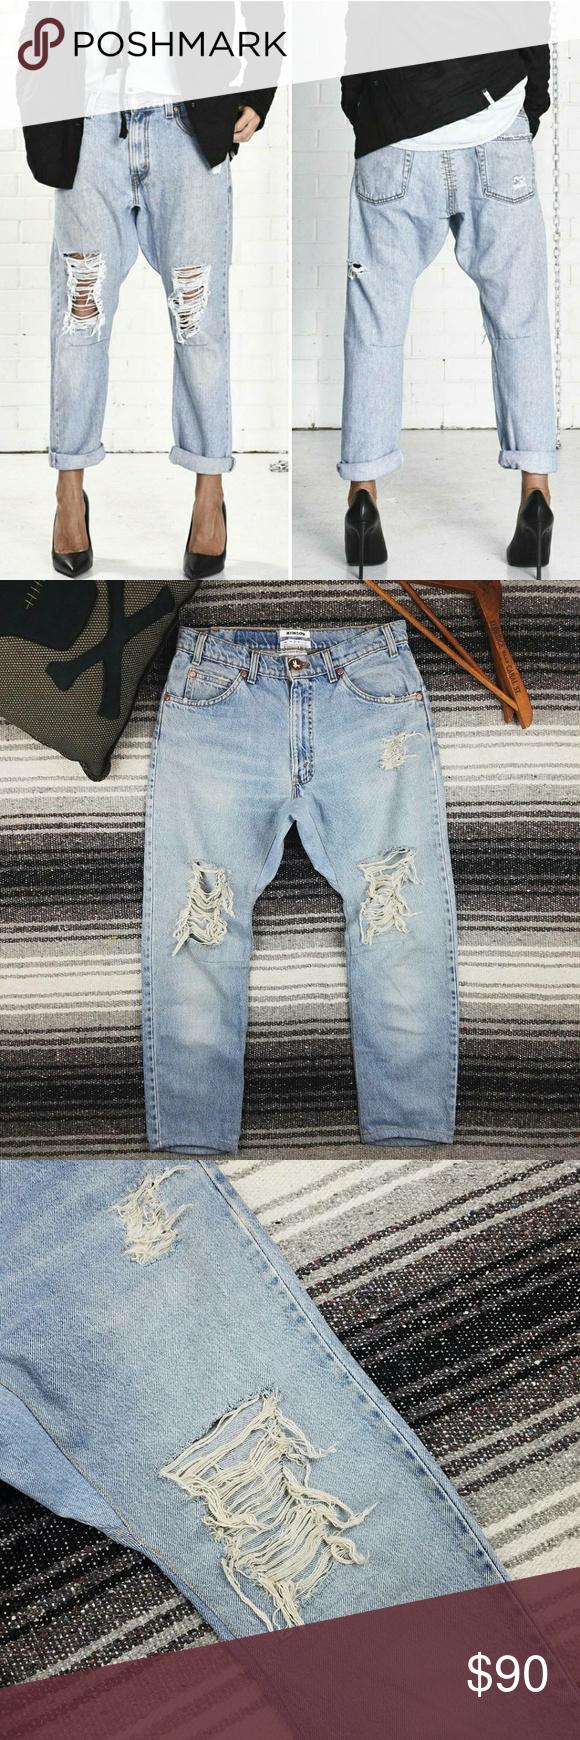 One Teaspoon Nwt Vintage Saints Denim Jeans Brand New With Original Tag One X One Teaspoon Vintage Saints Deni Jeans Brands Boyfriend Jeans Clothes Design